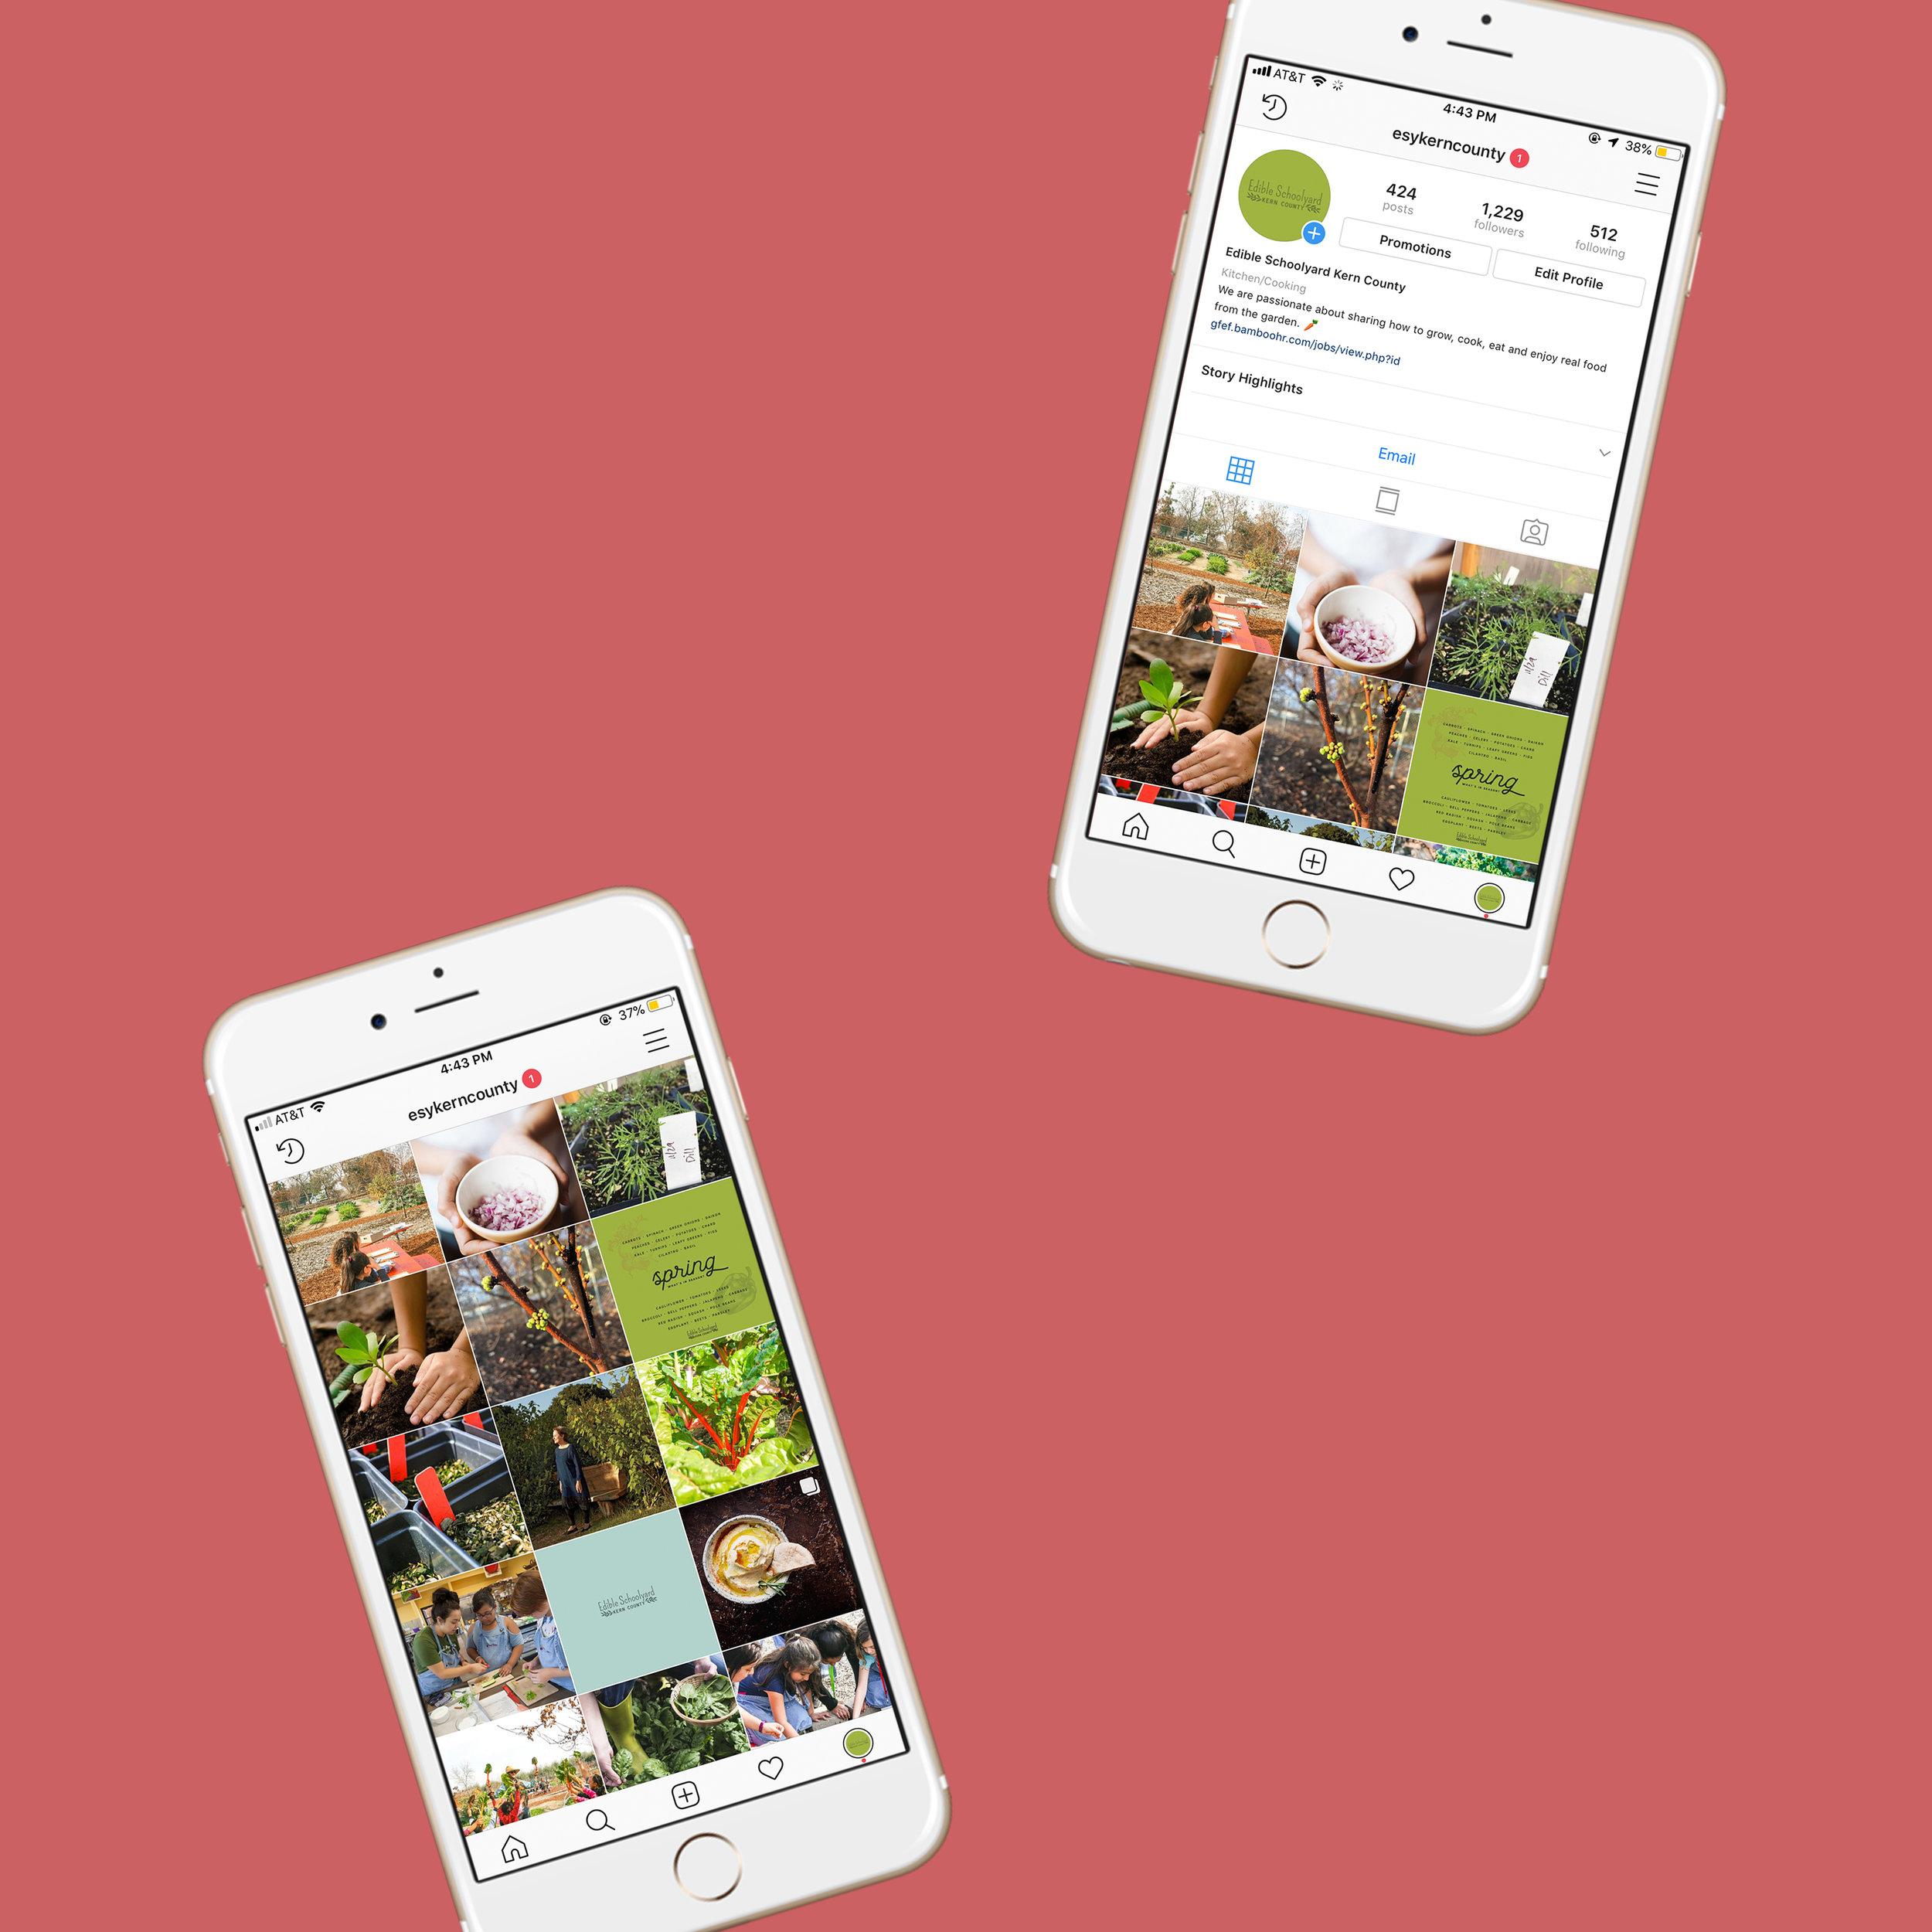 Edible-Schoolyard-Kern-County-Promotion_Website_1.jpg